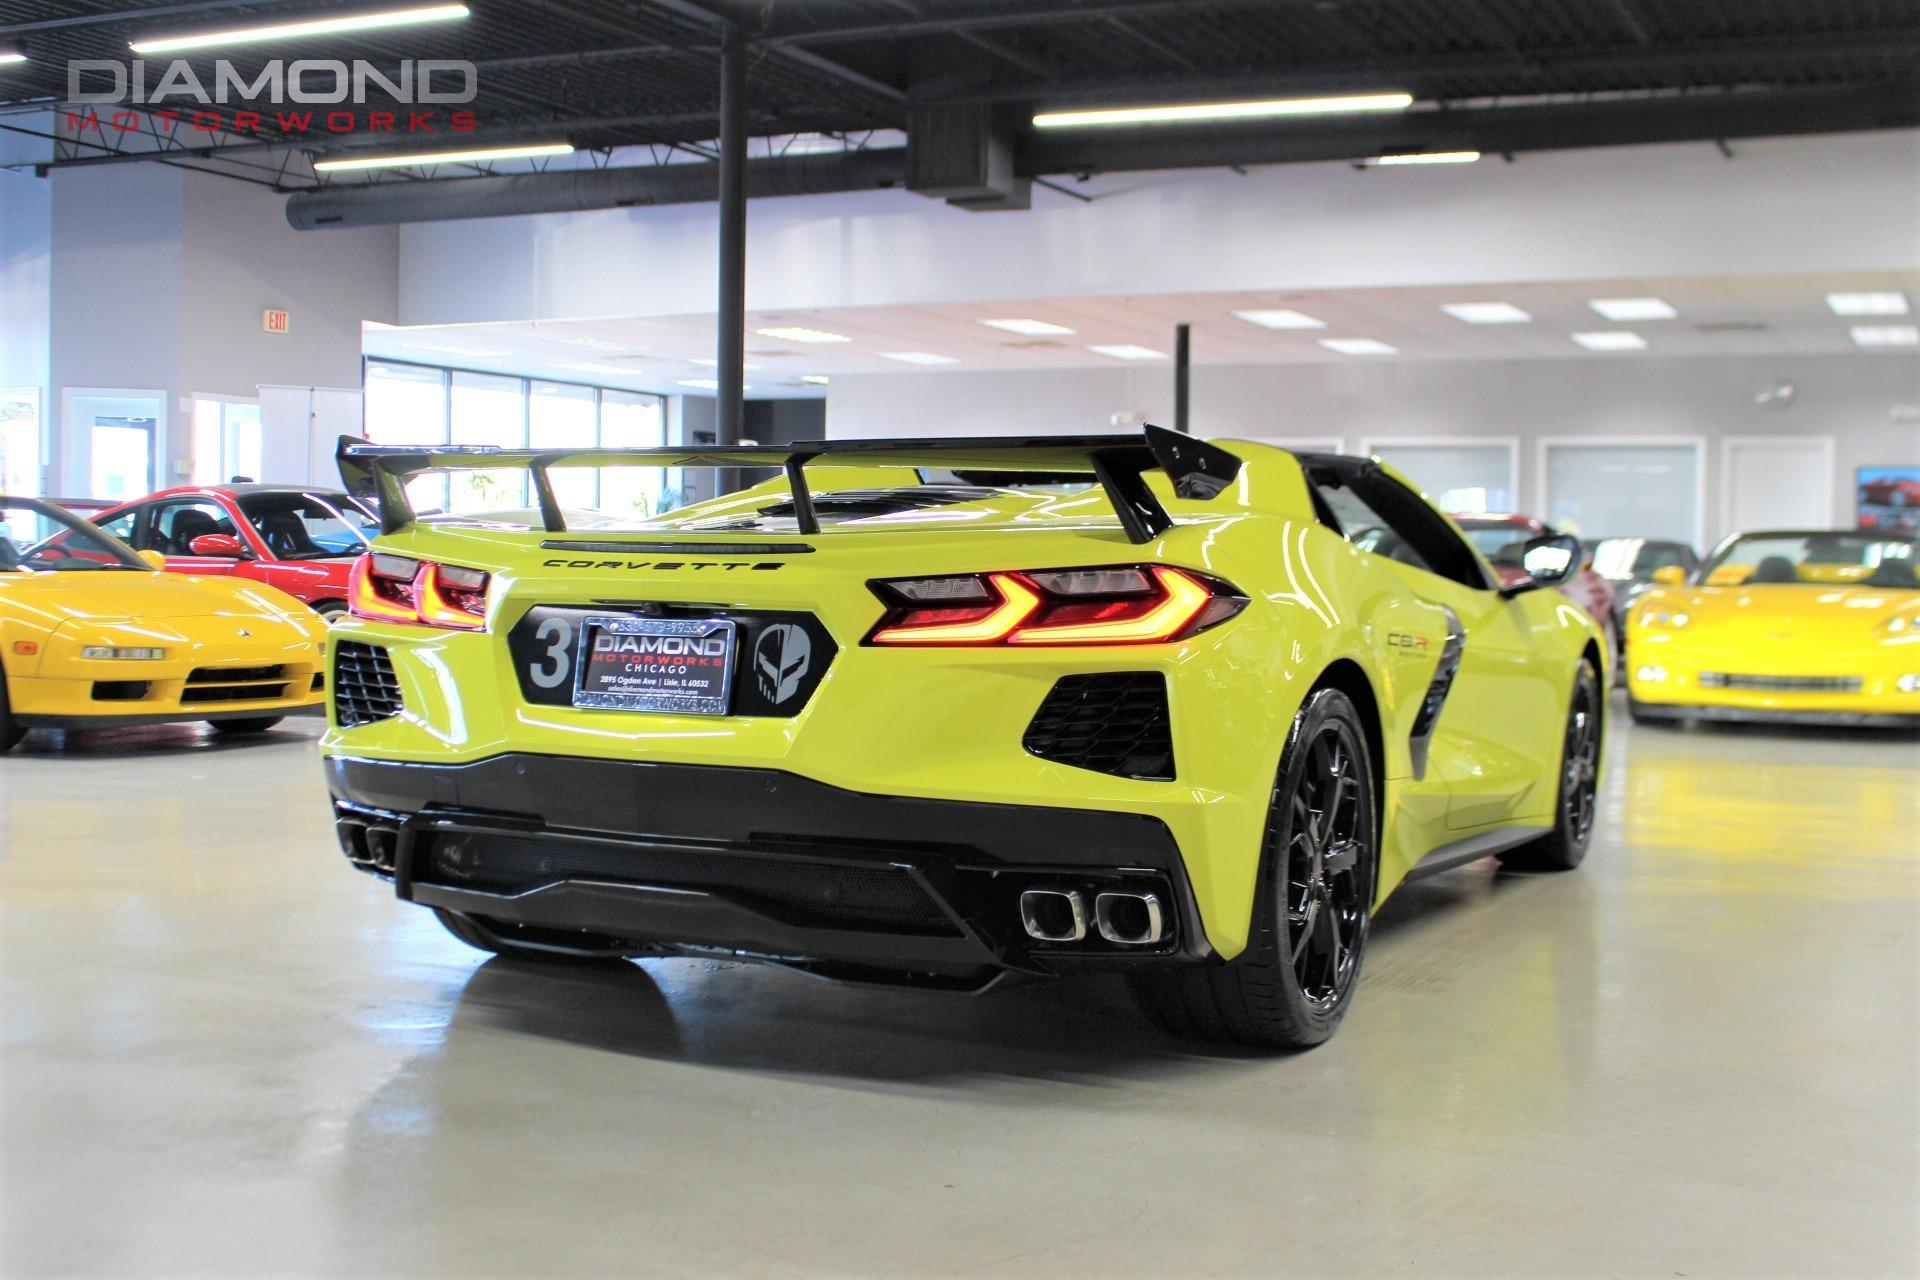 Used-2022-Chevrolet-Corvette-Stingray-C8R